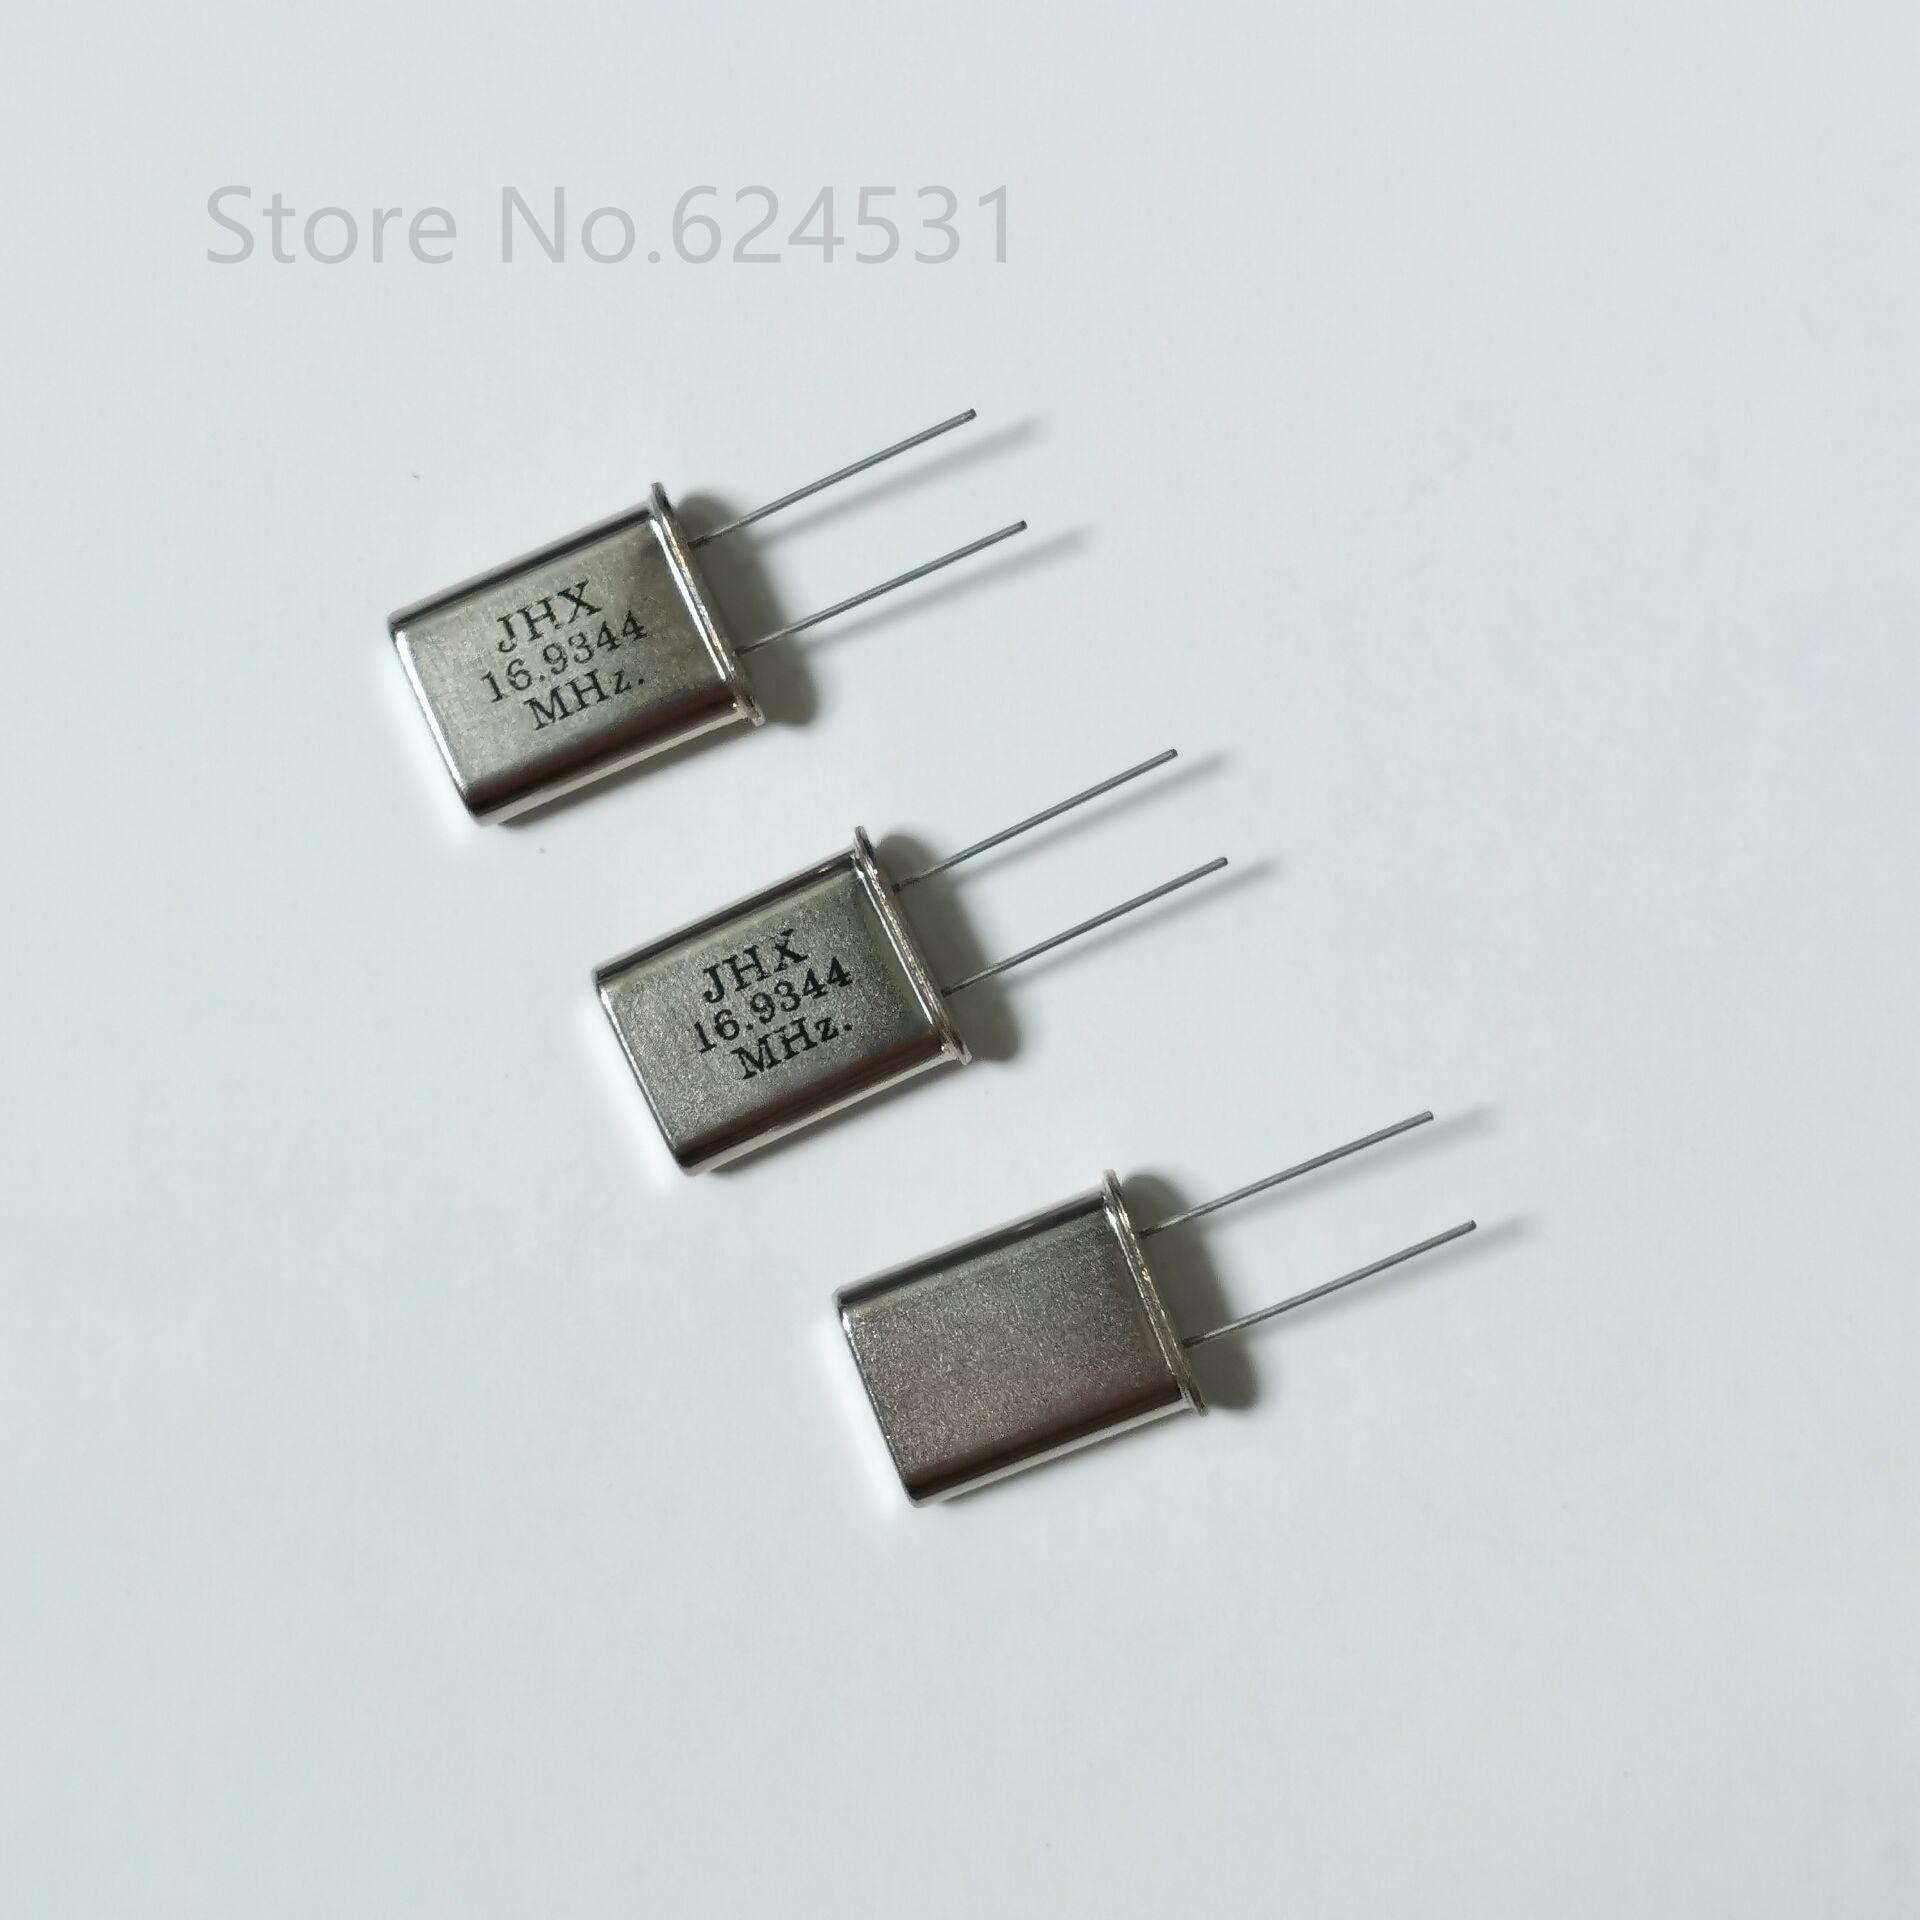 10pcs 13.56MHz Resonator Crystal Oscillator Passive Quartz HC-49S Through Holes